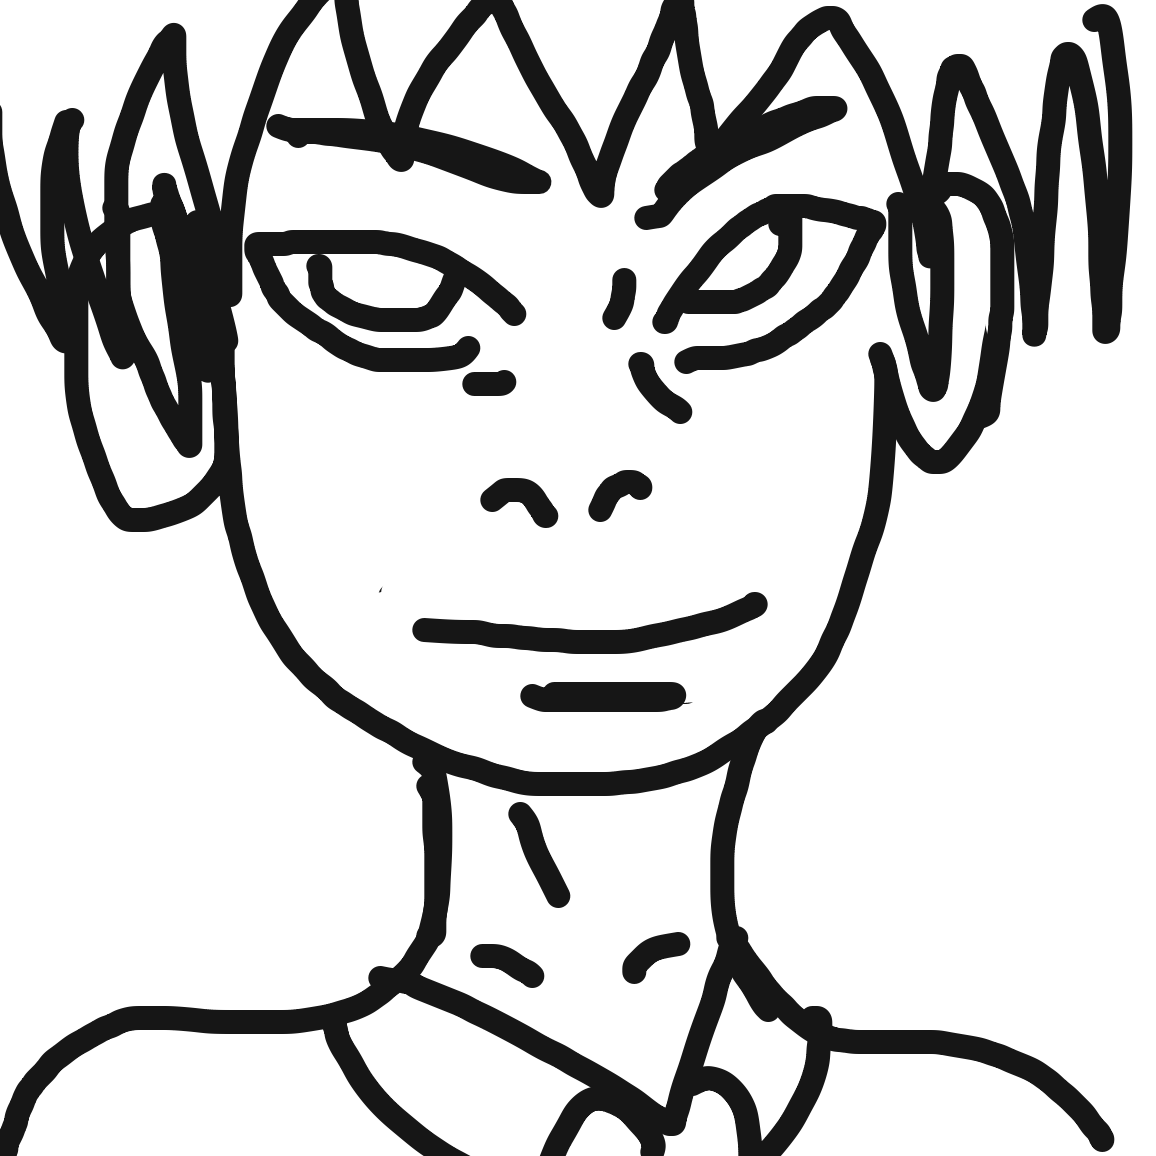 Profile picture for the comic strip artist, J TEA the artist